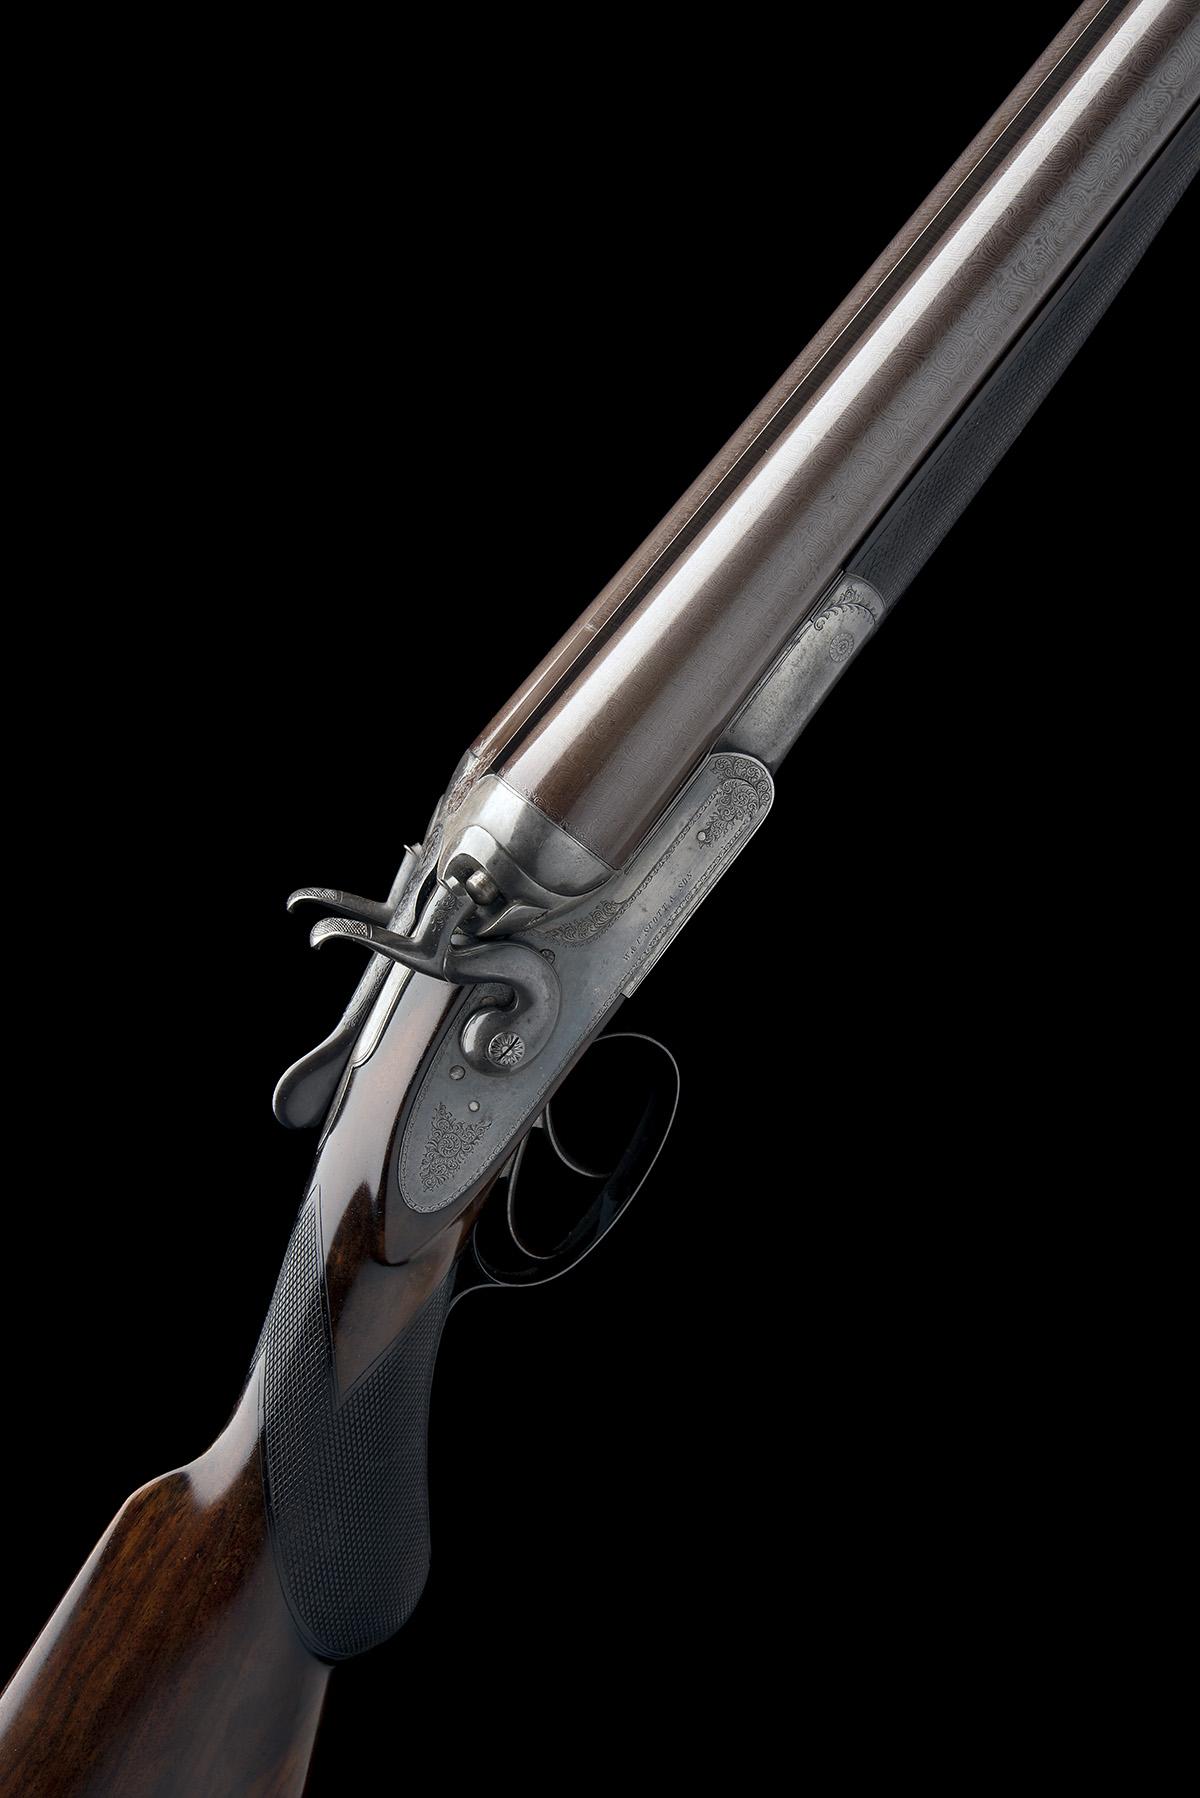 W. & C. SCOTT & SON AN 8-BORE 1865 PATENT DOUBLE-BARRELLED TOPLEVER HAMMERGUN, serial no. 29673,